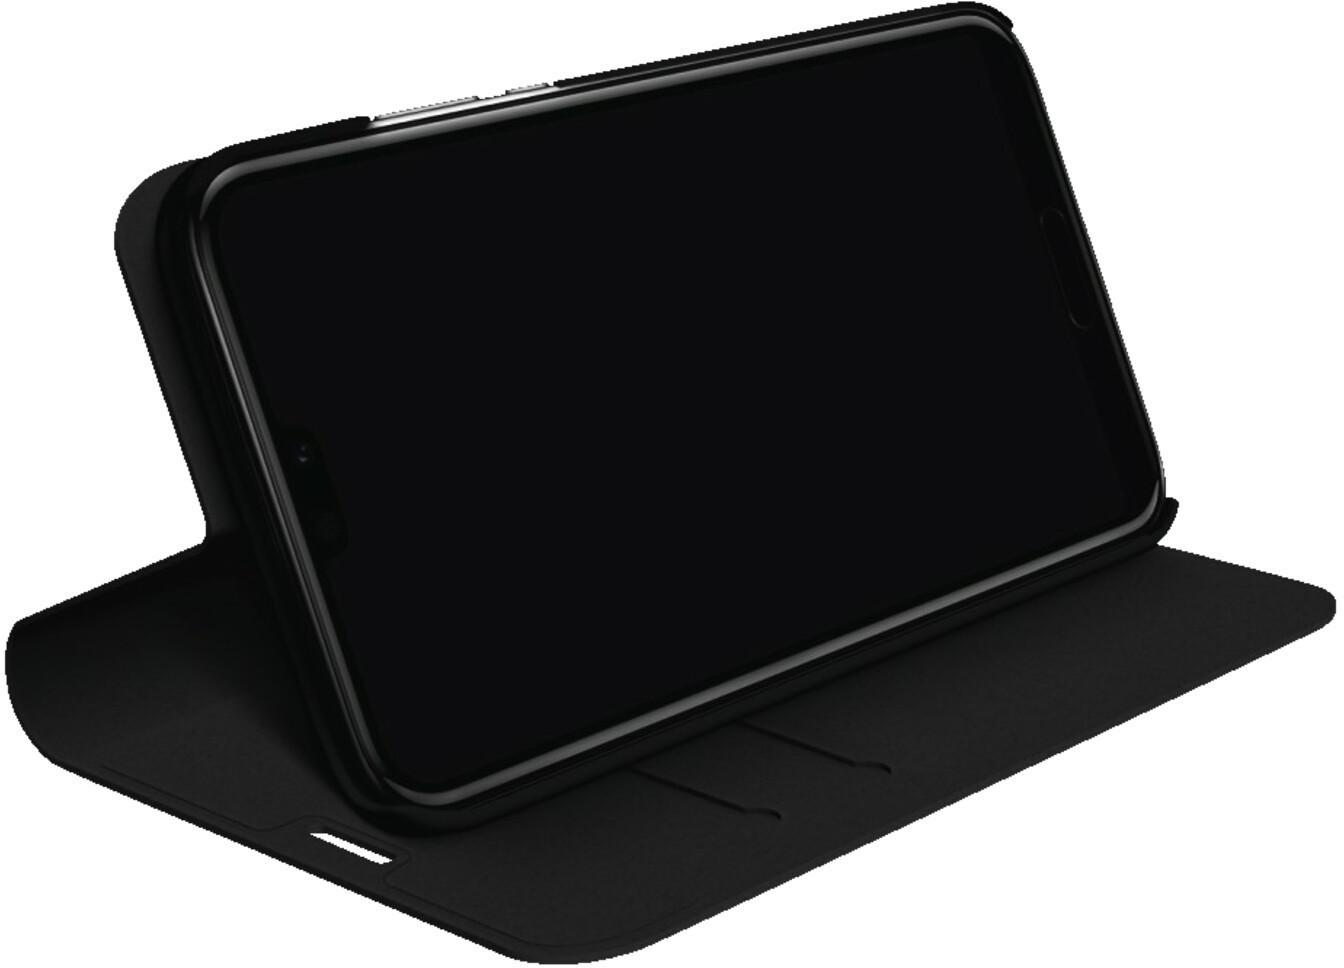 Image of Black Rock Booklet The Standard Huawei P20 Pro Black